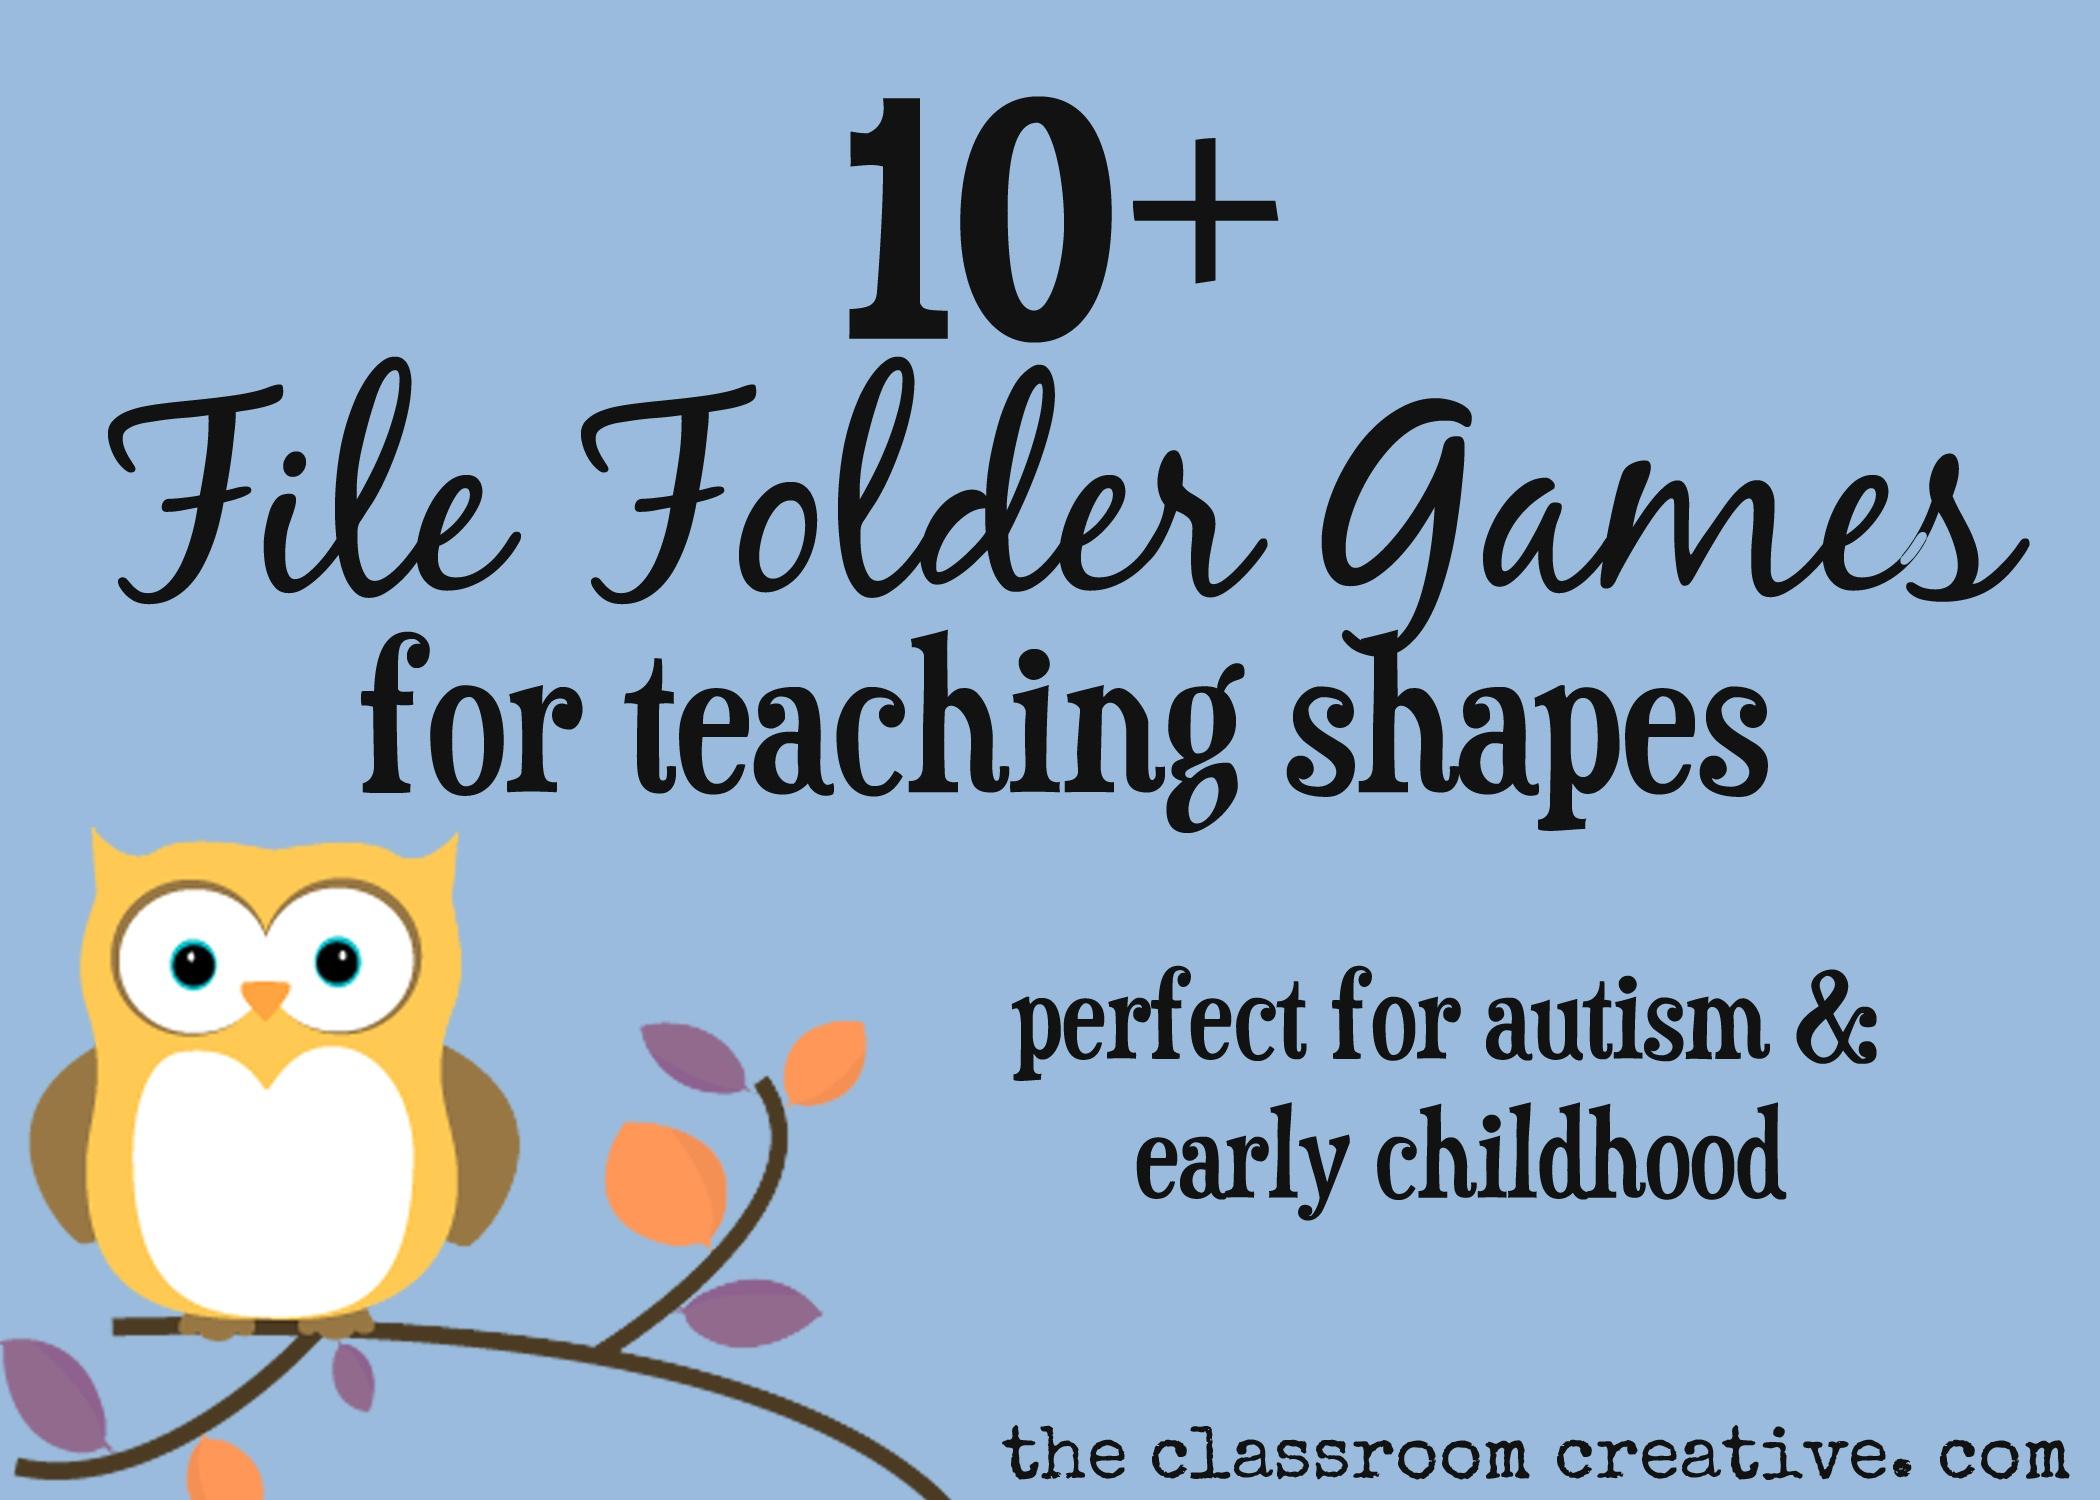 File Folder Games For Teaching Shapes - Free Printable File Folders For Preschoolers